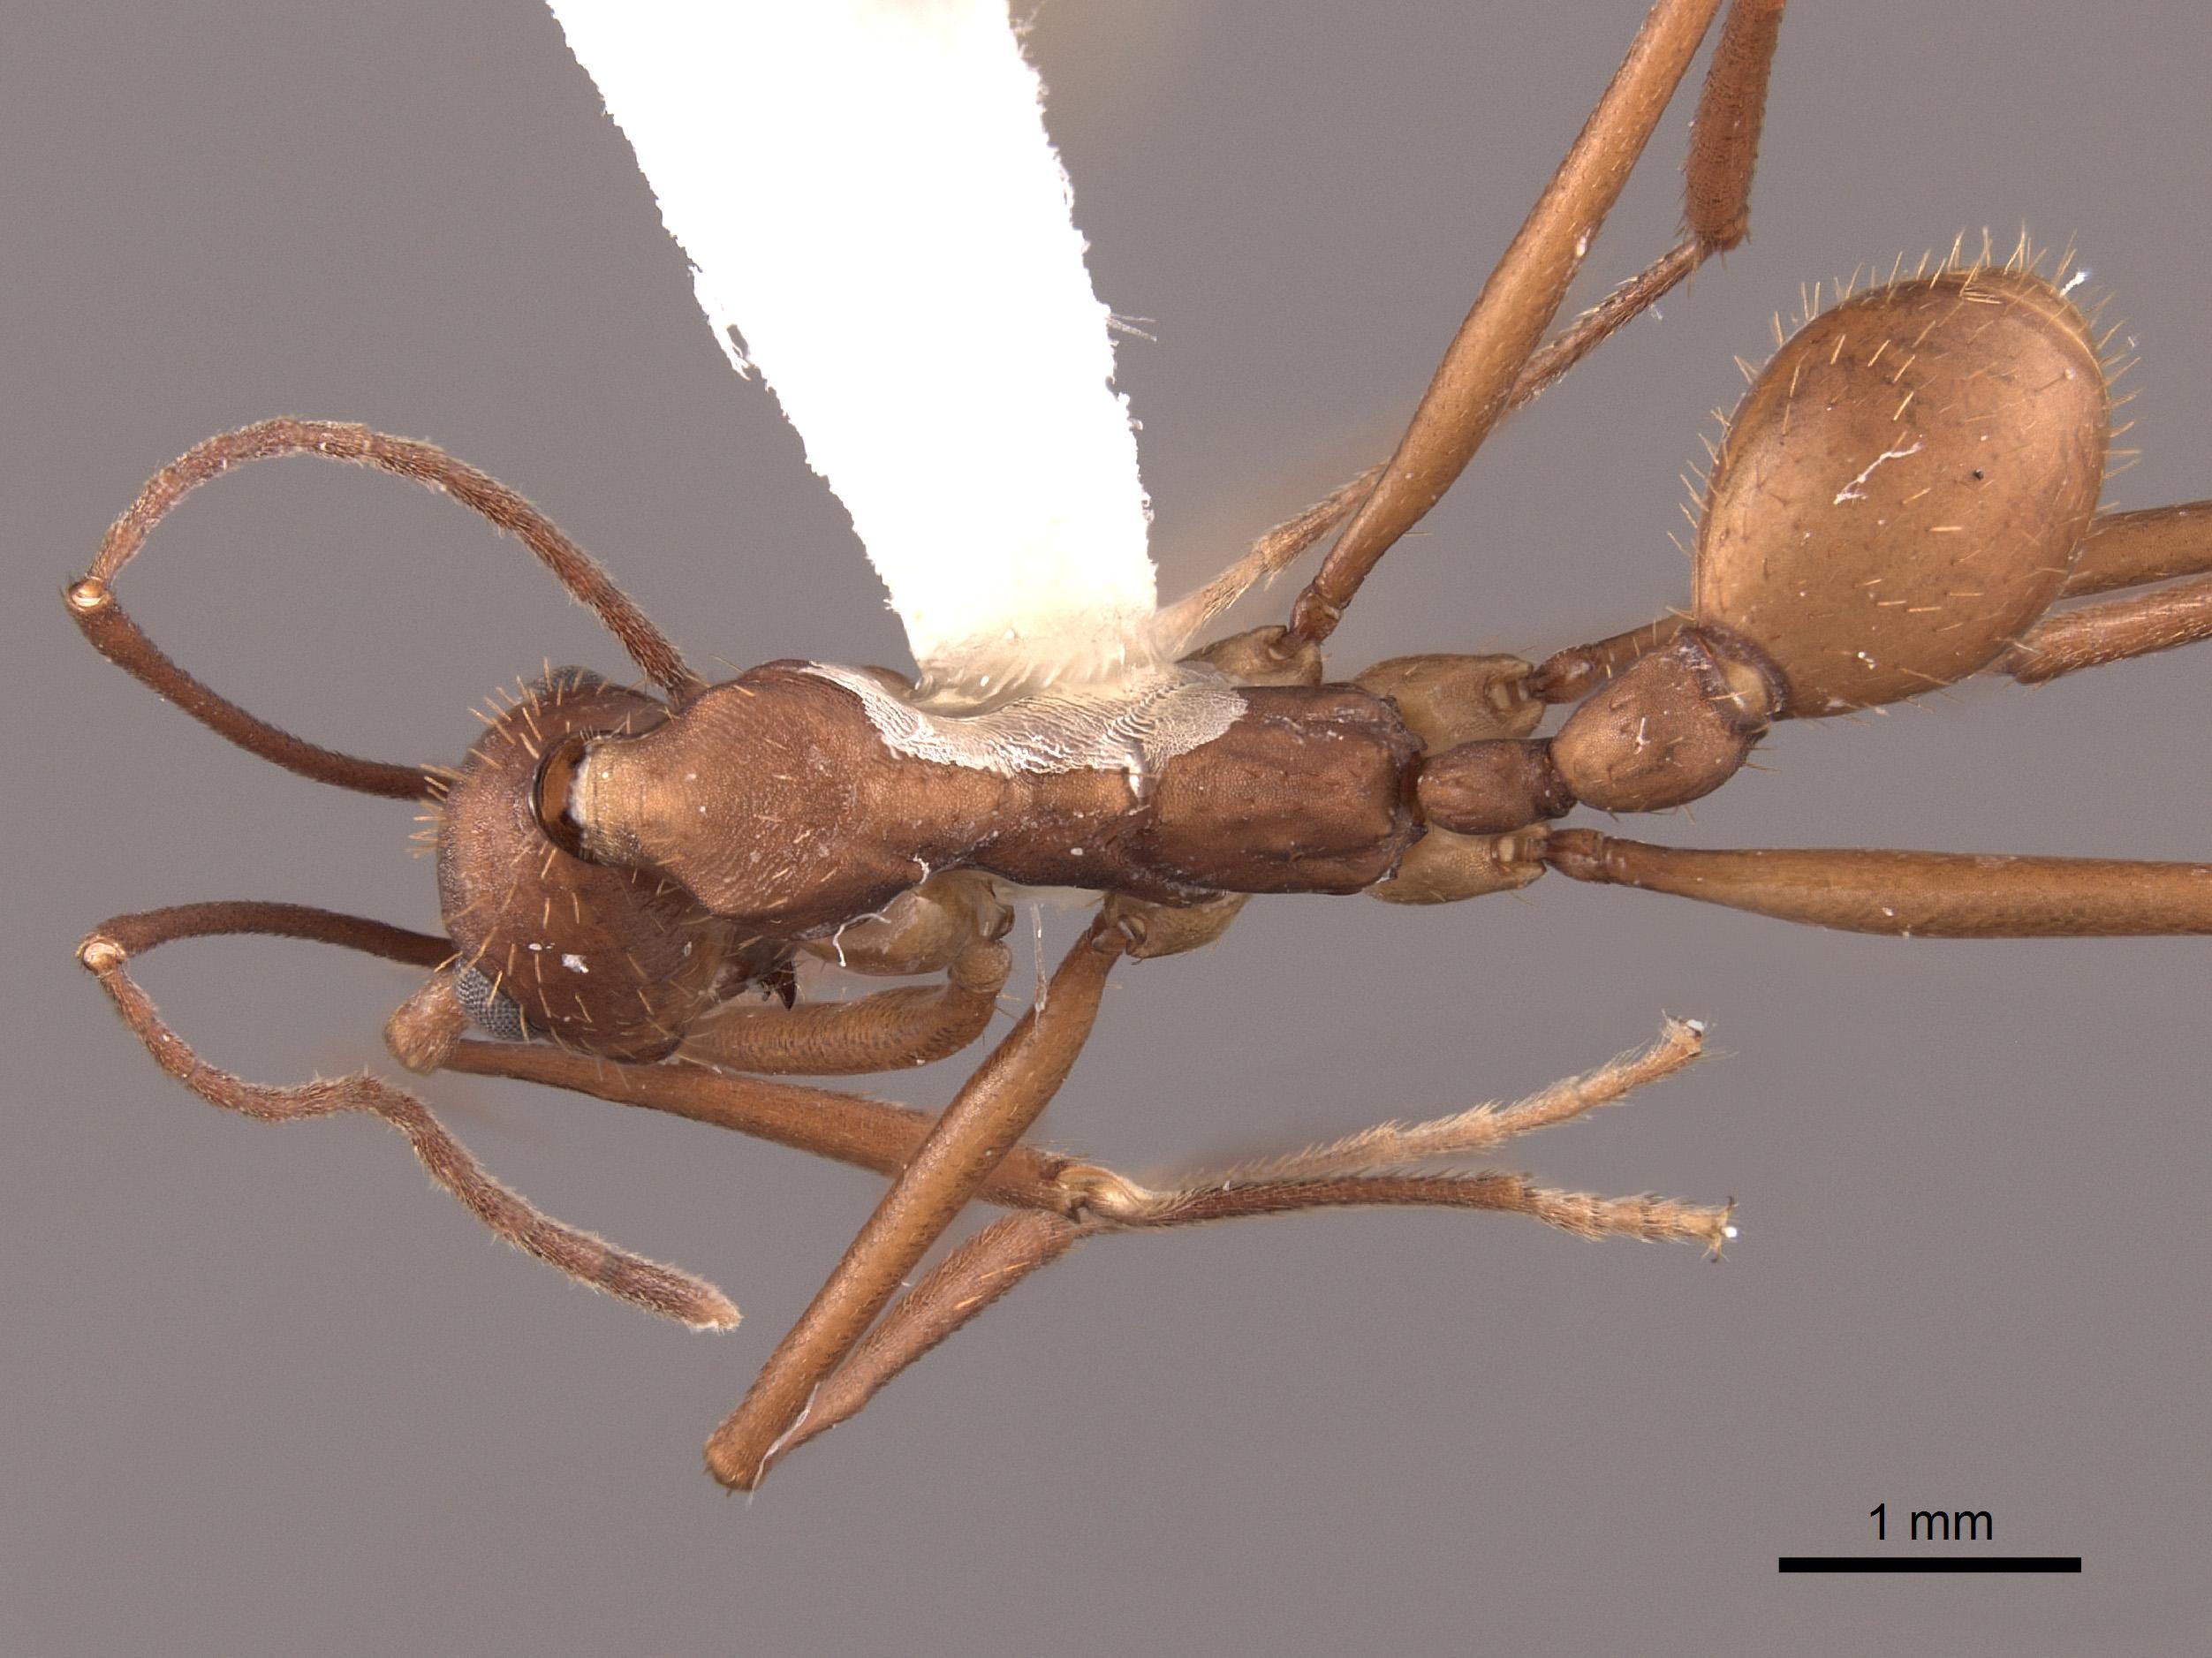 Image of Aphaenogaster araneoides